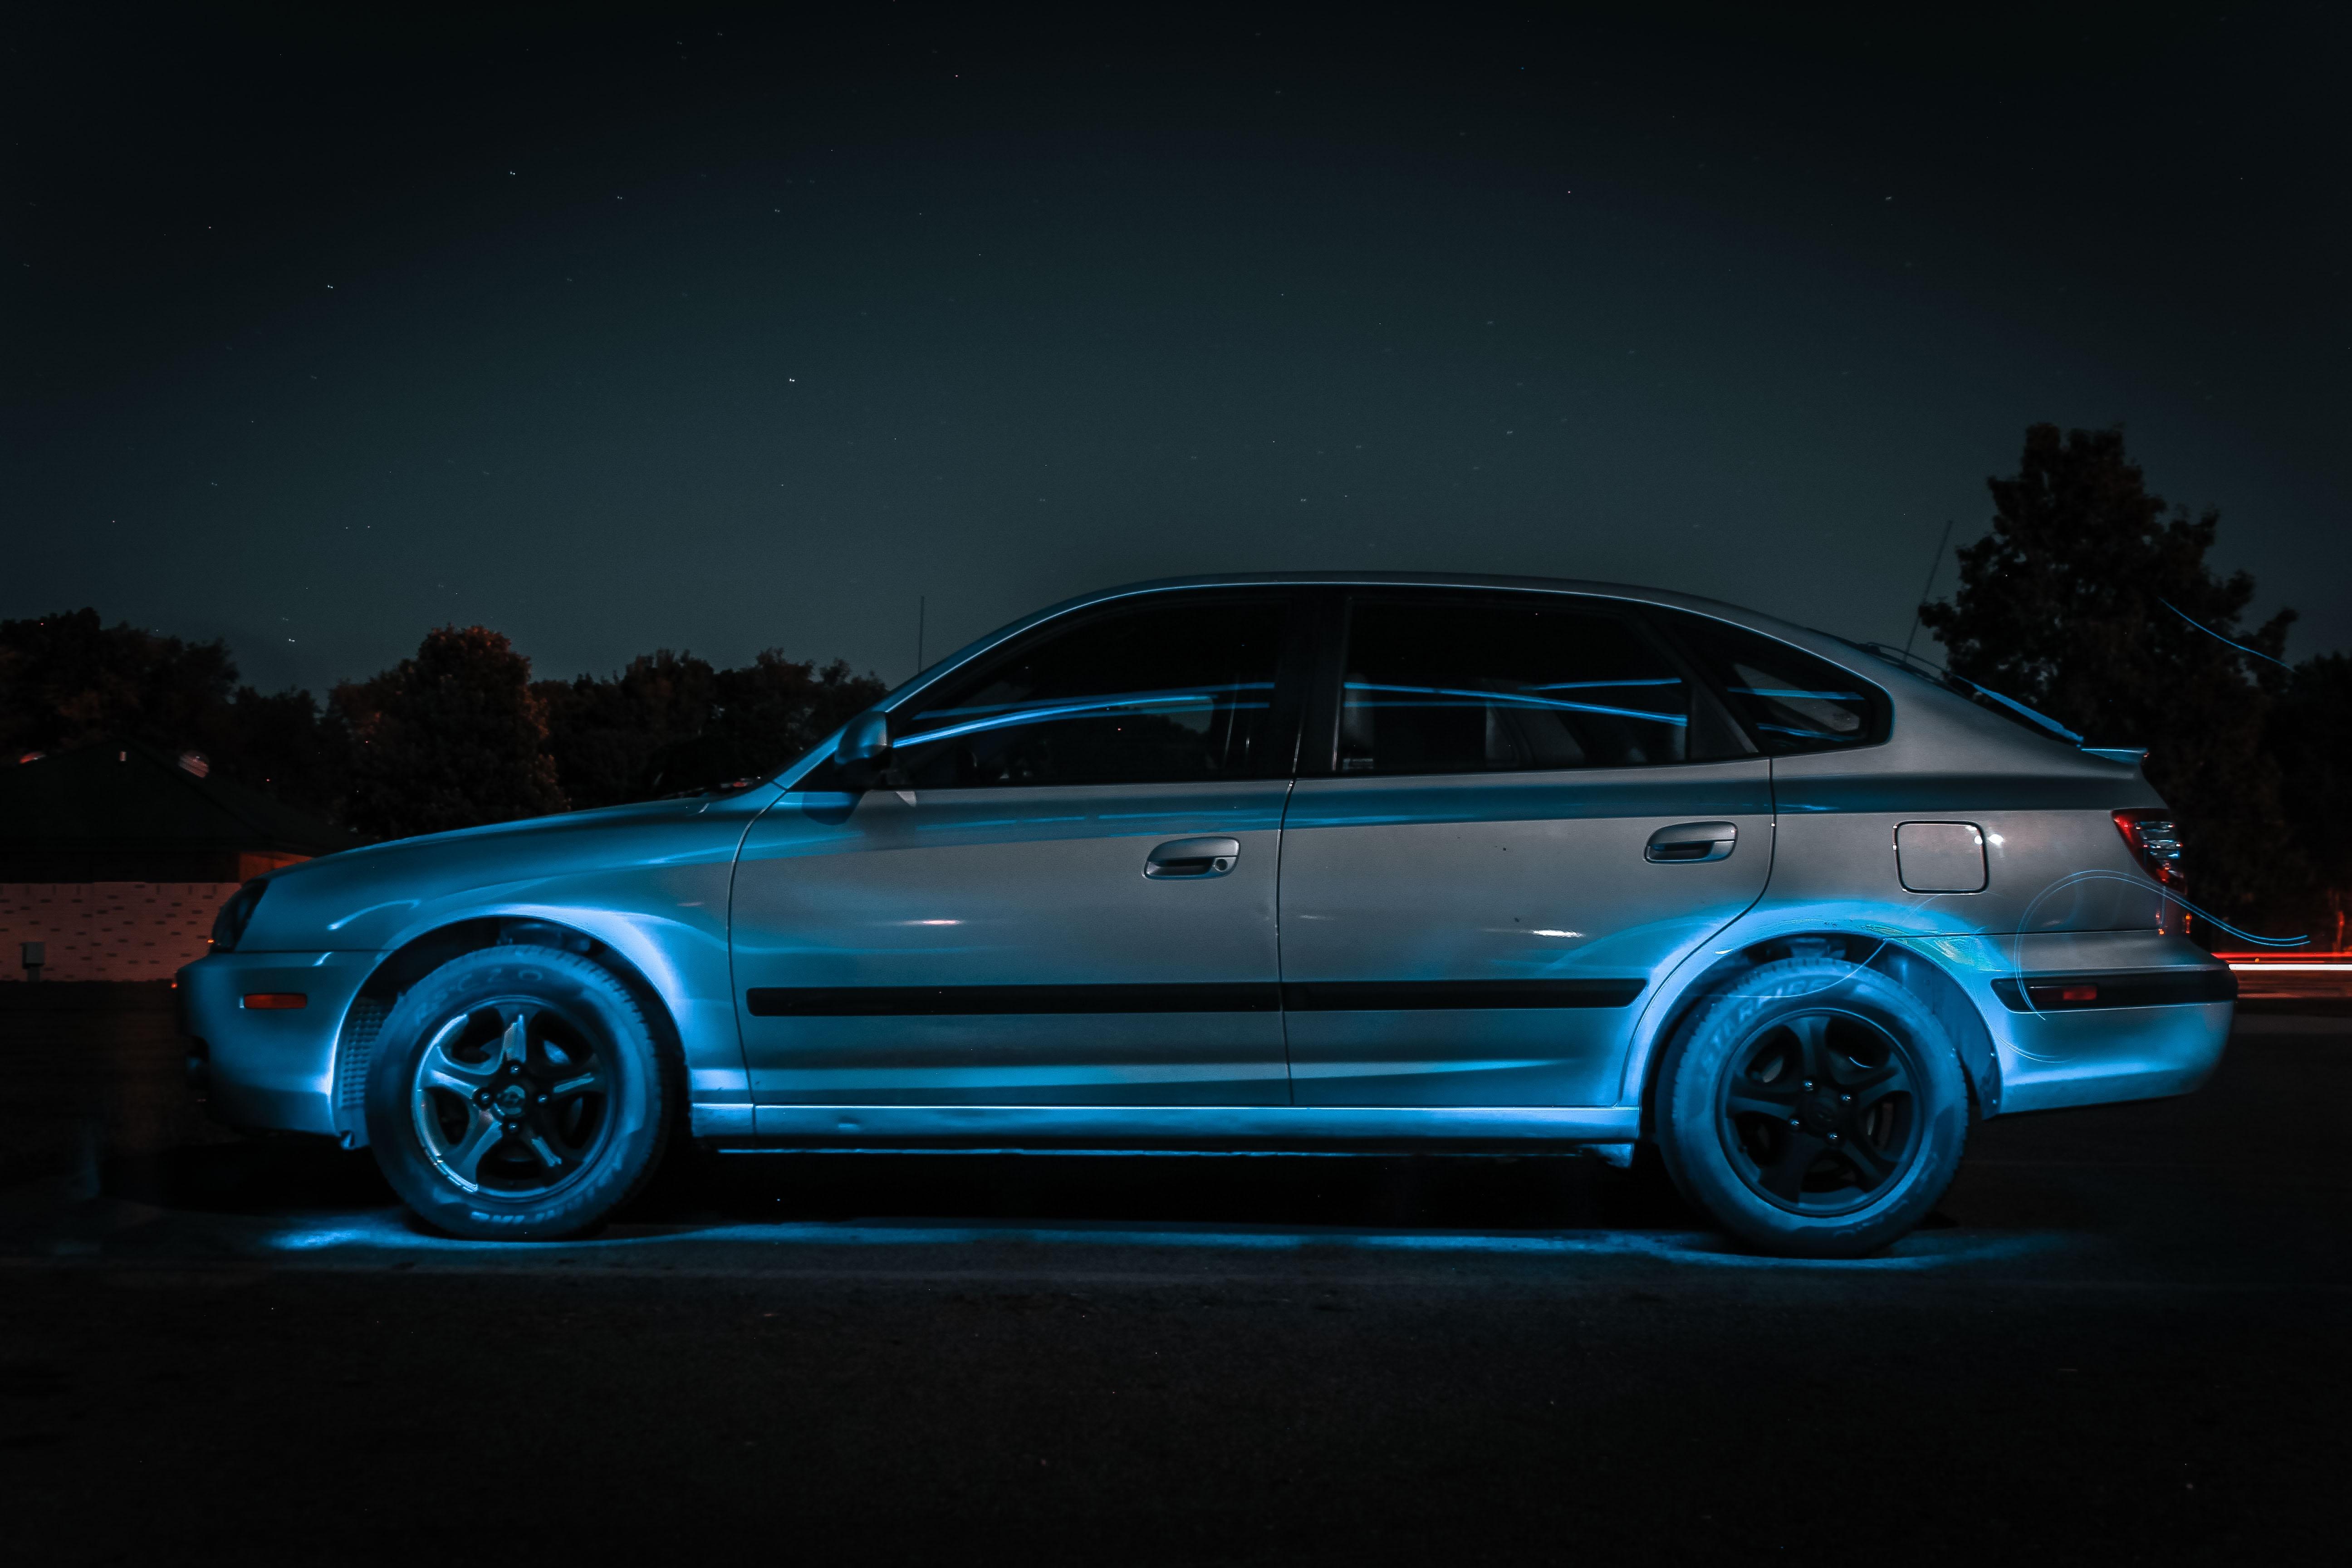 silver sedan park on road with blue lights